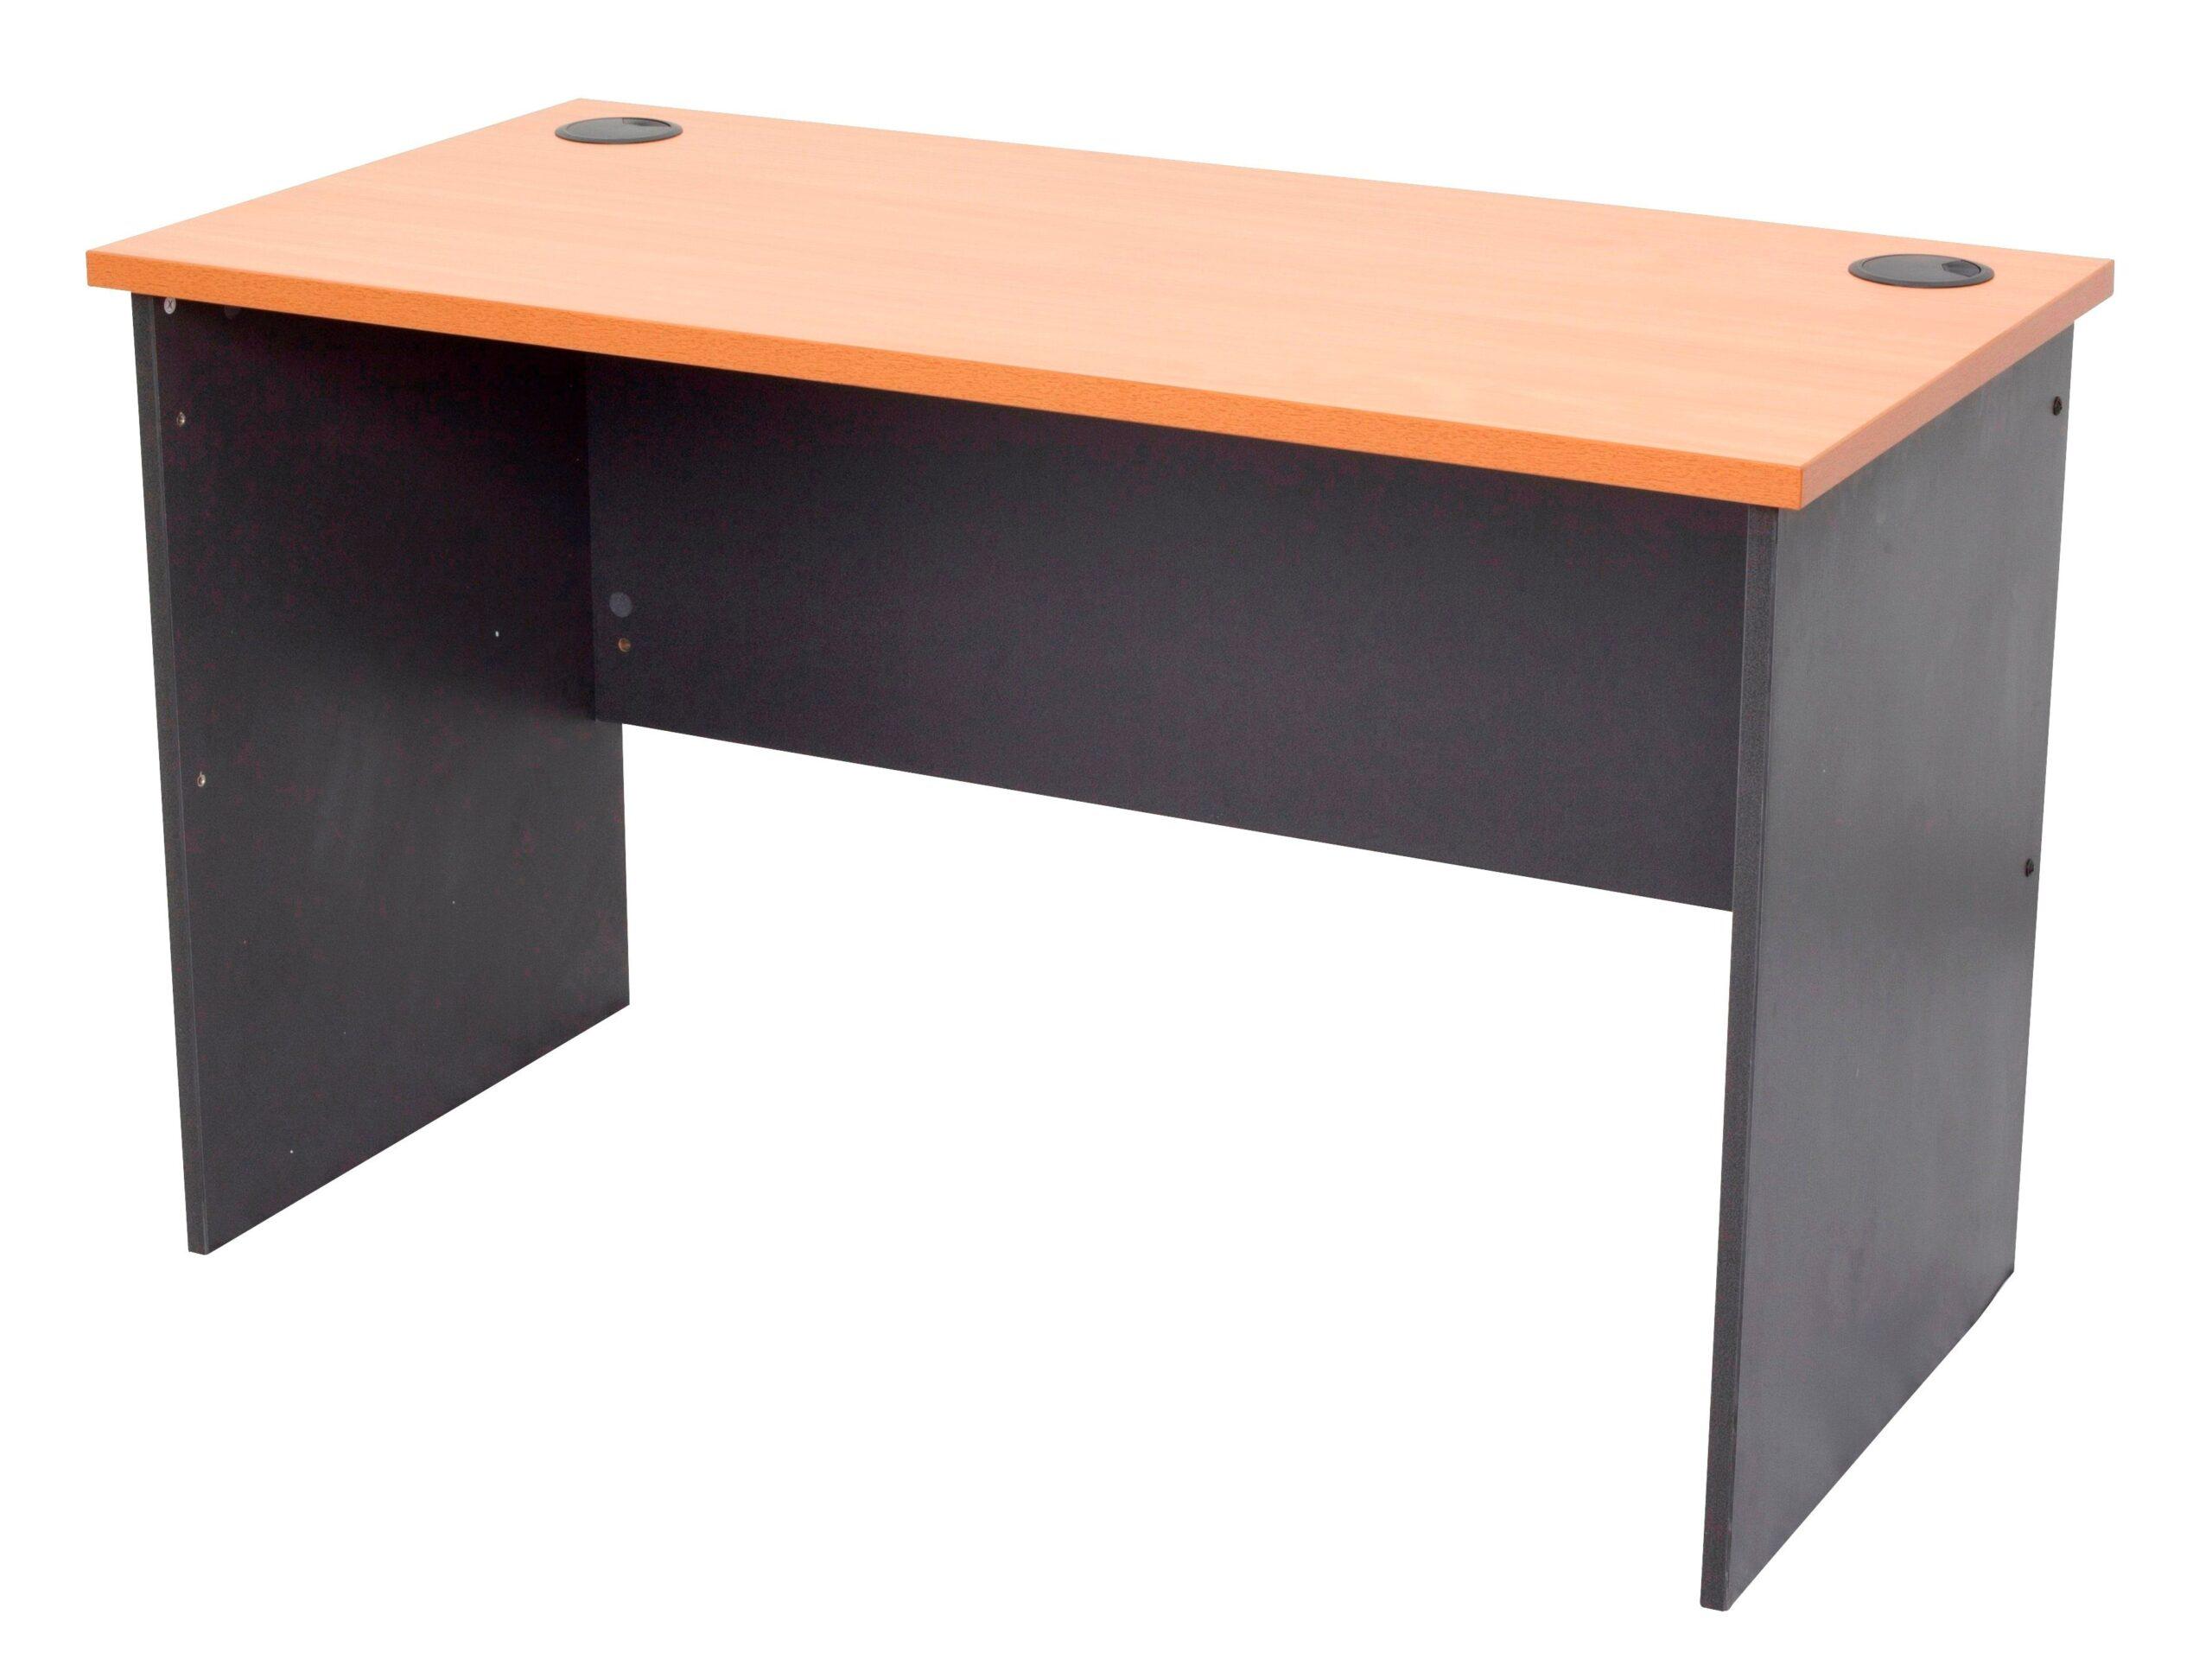 Rapid Worker Open Workstation (4 Sizes)